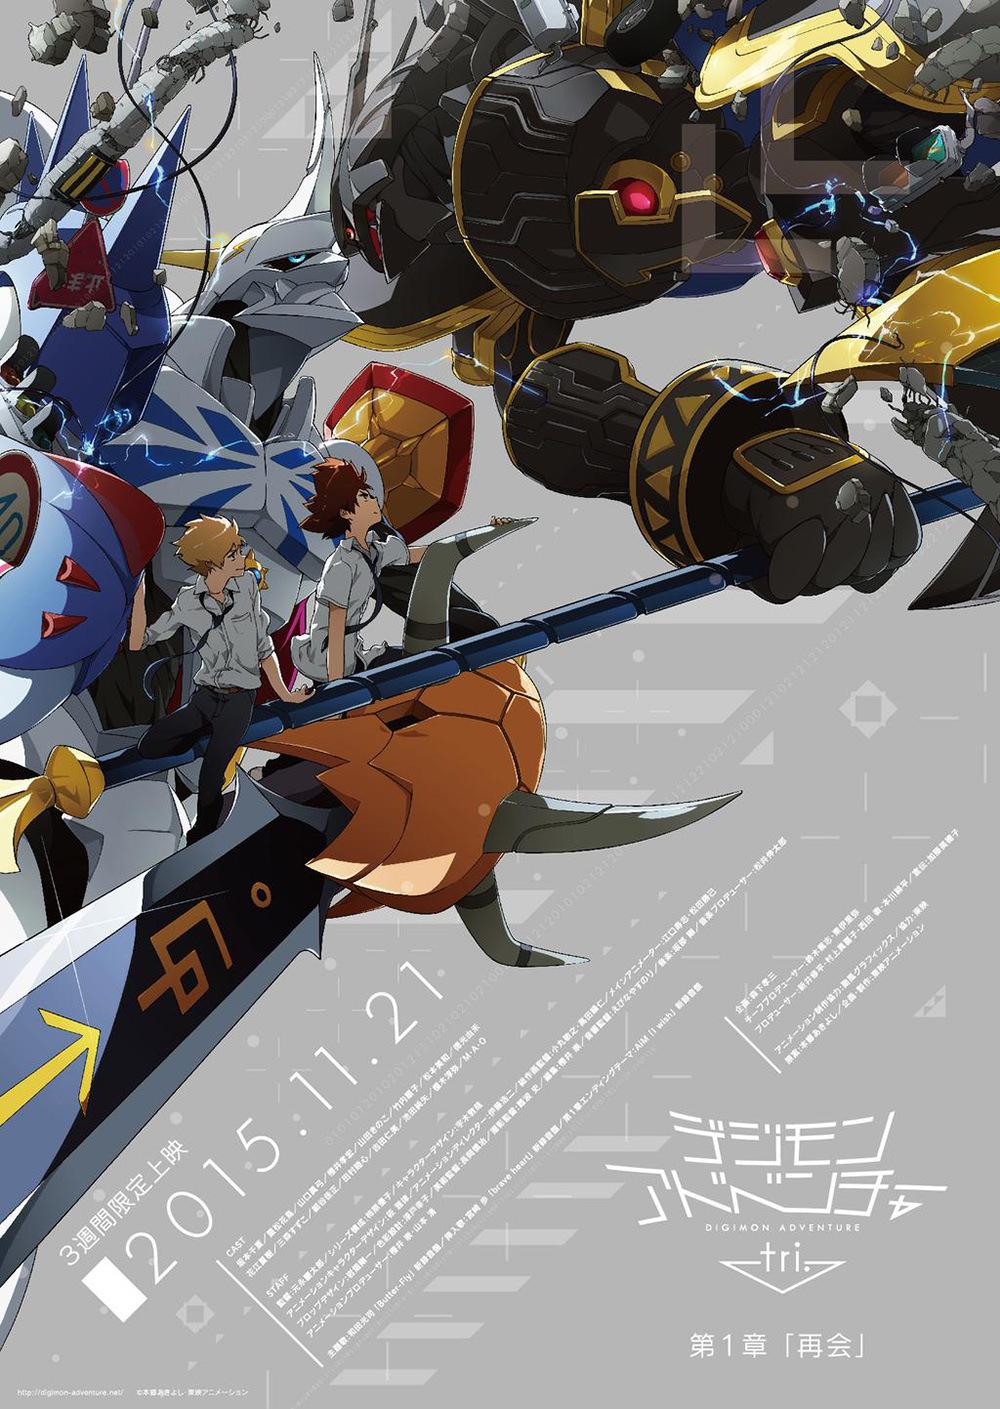 Digimon-Adventure-tri.-Omegamon-Vs-Alphamon-anime-Visual